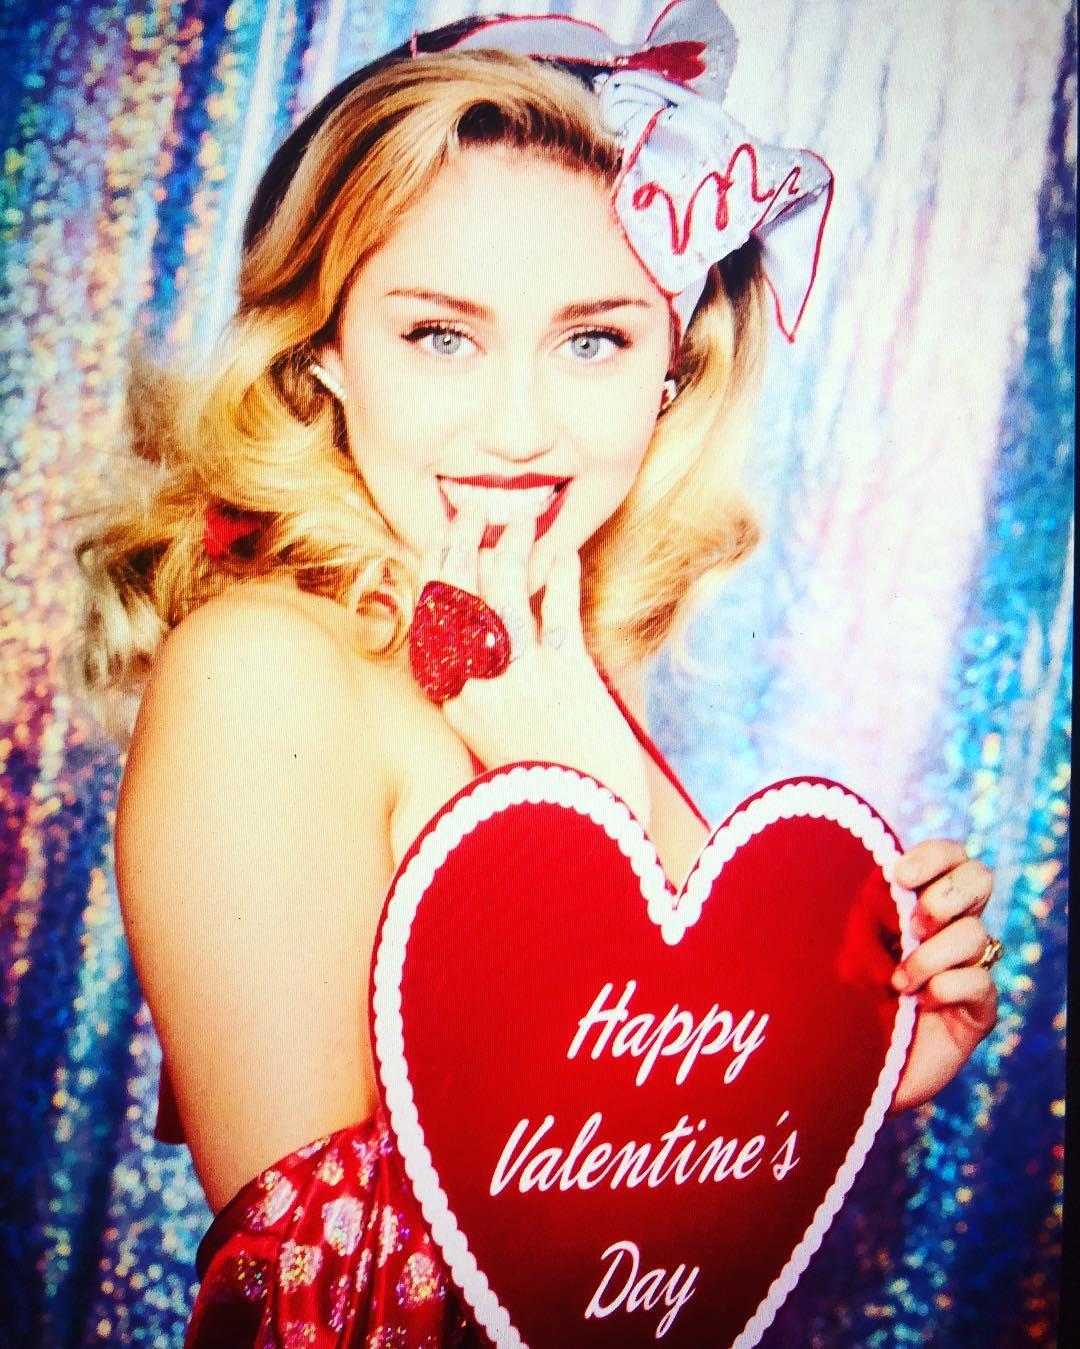 Miley Cyrus Hot Photos on Instagram